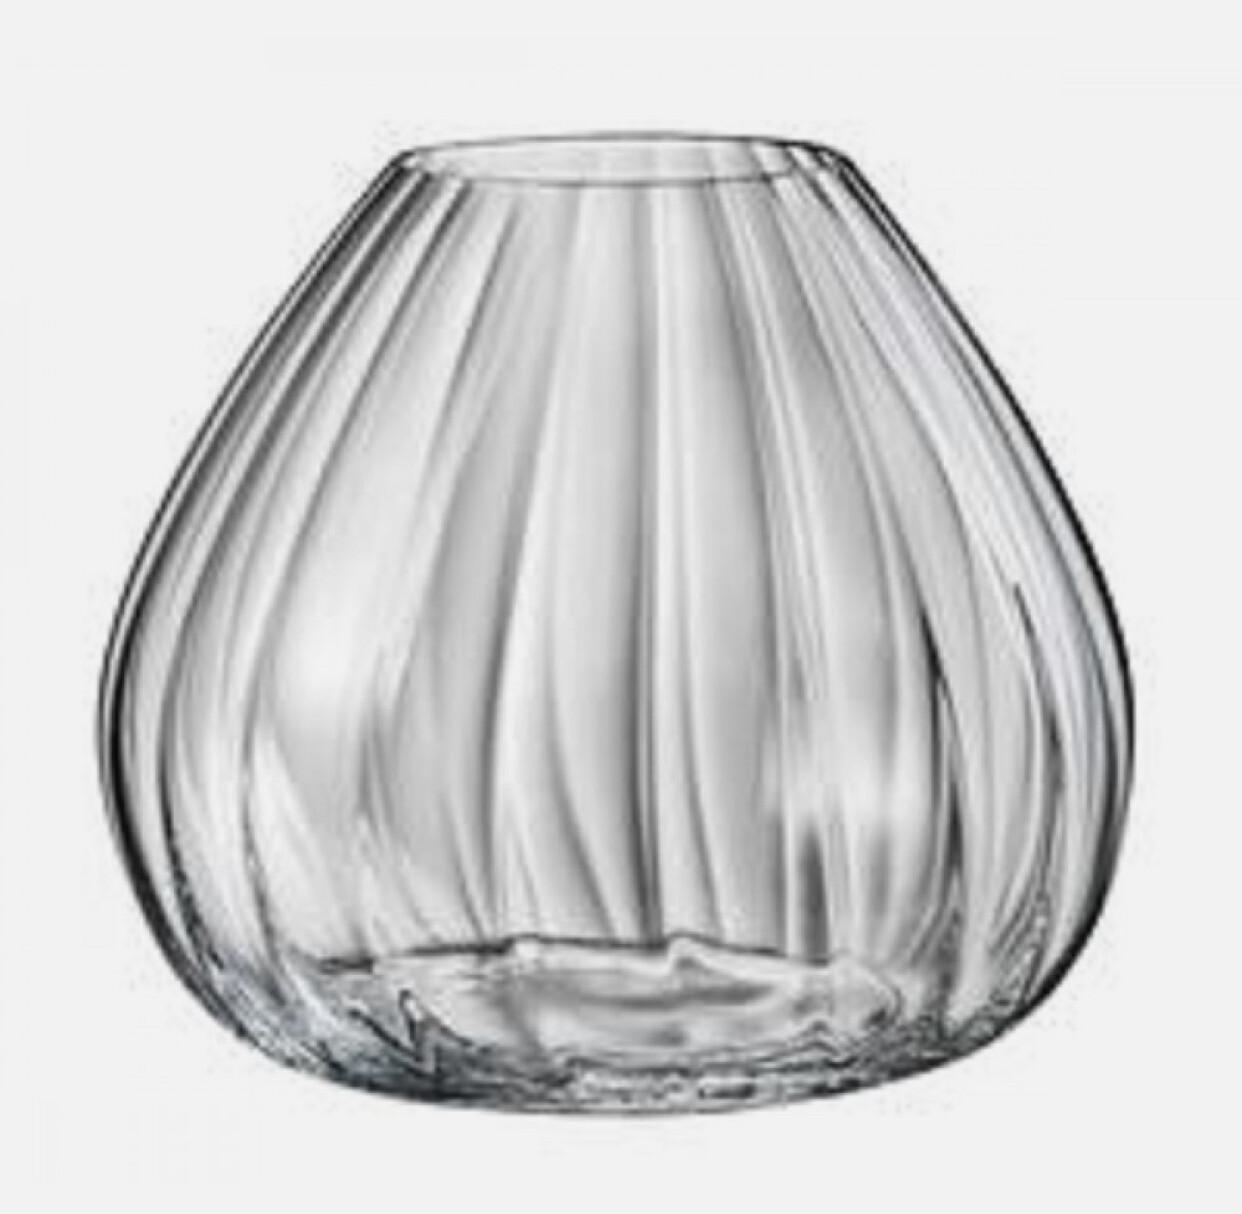 BOHEMIA WATERFALL - Bowl or Vase 48.5cm / 185mm